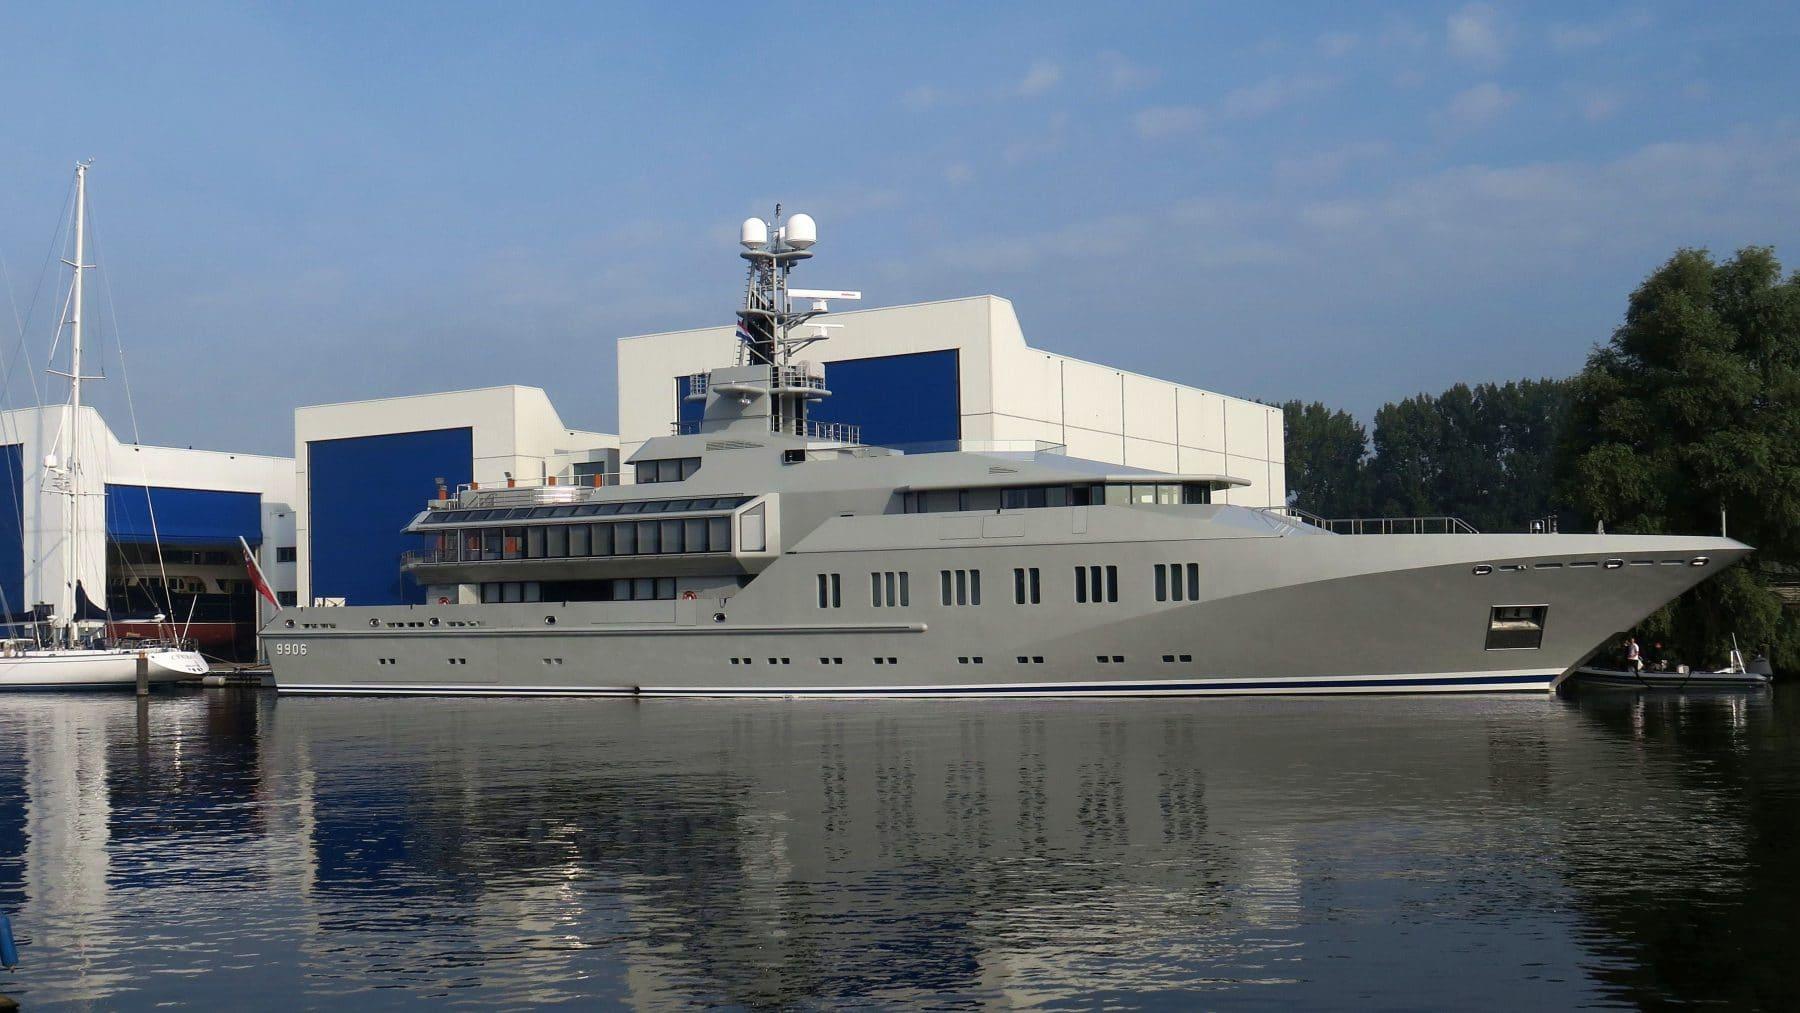 Royal Huisman to exploit former Holland Jachtbouw shipyard